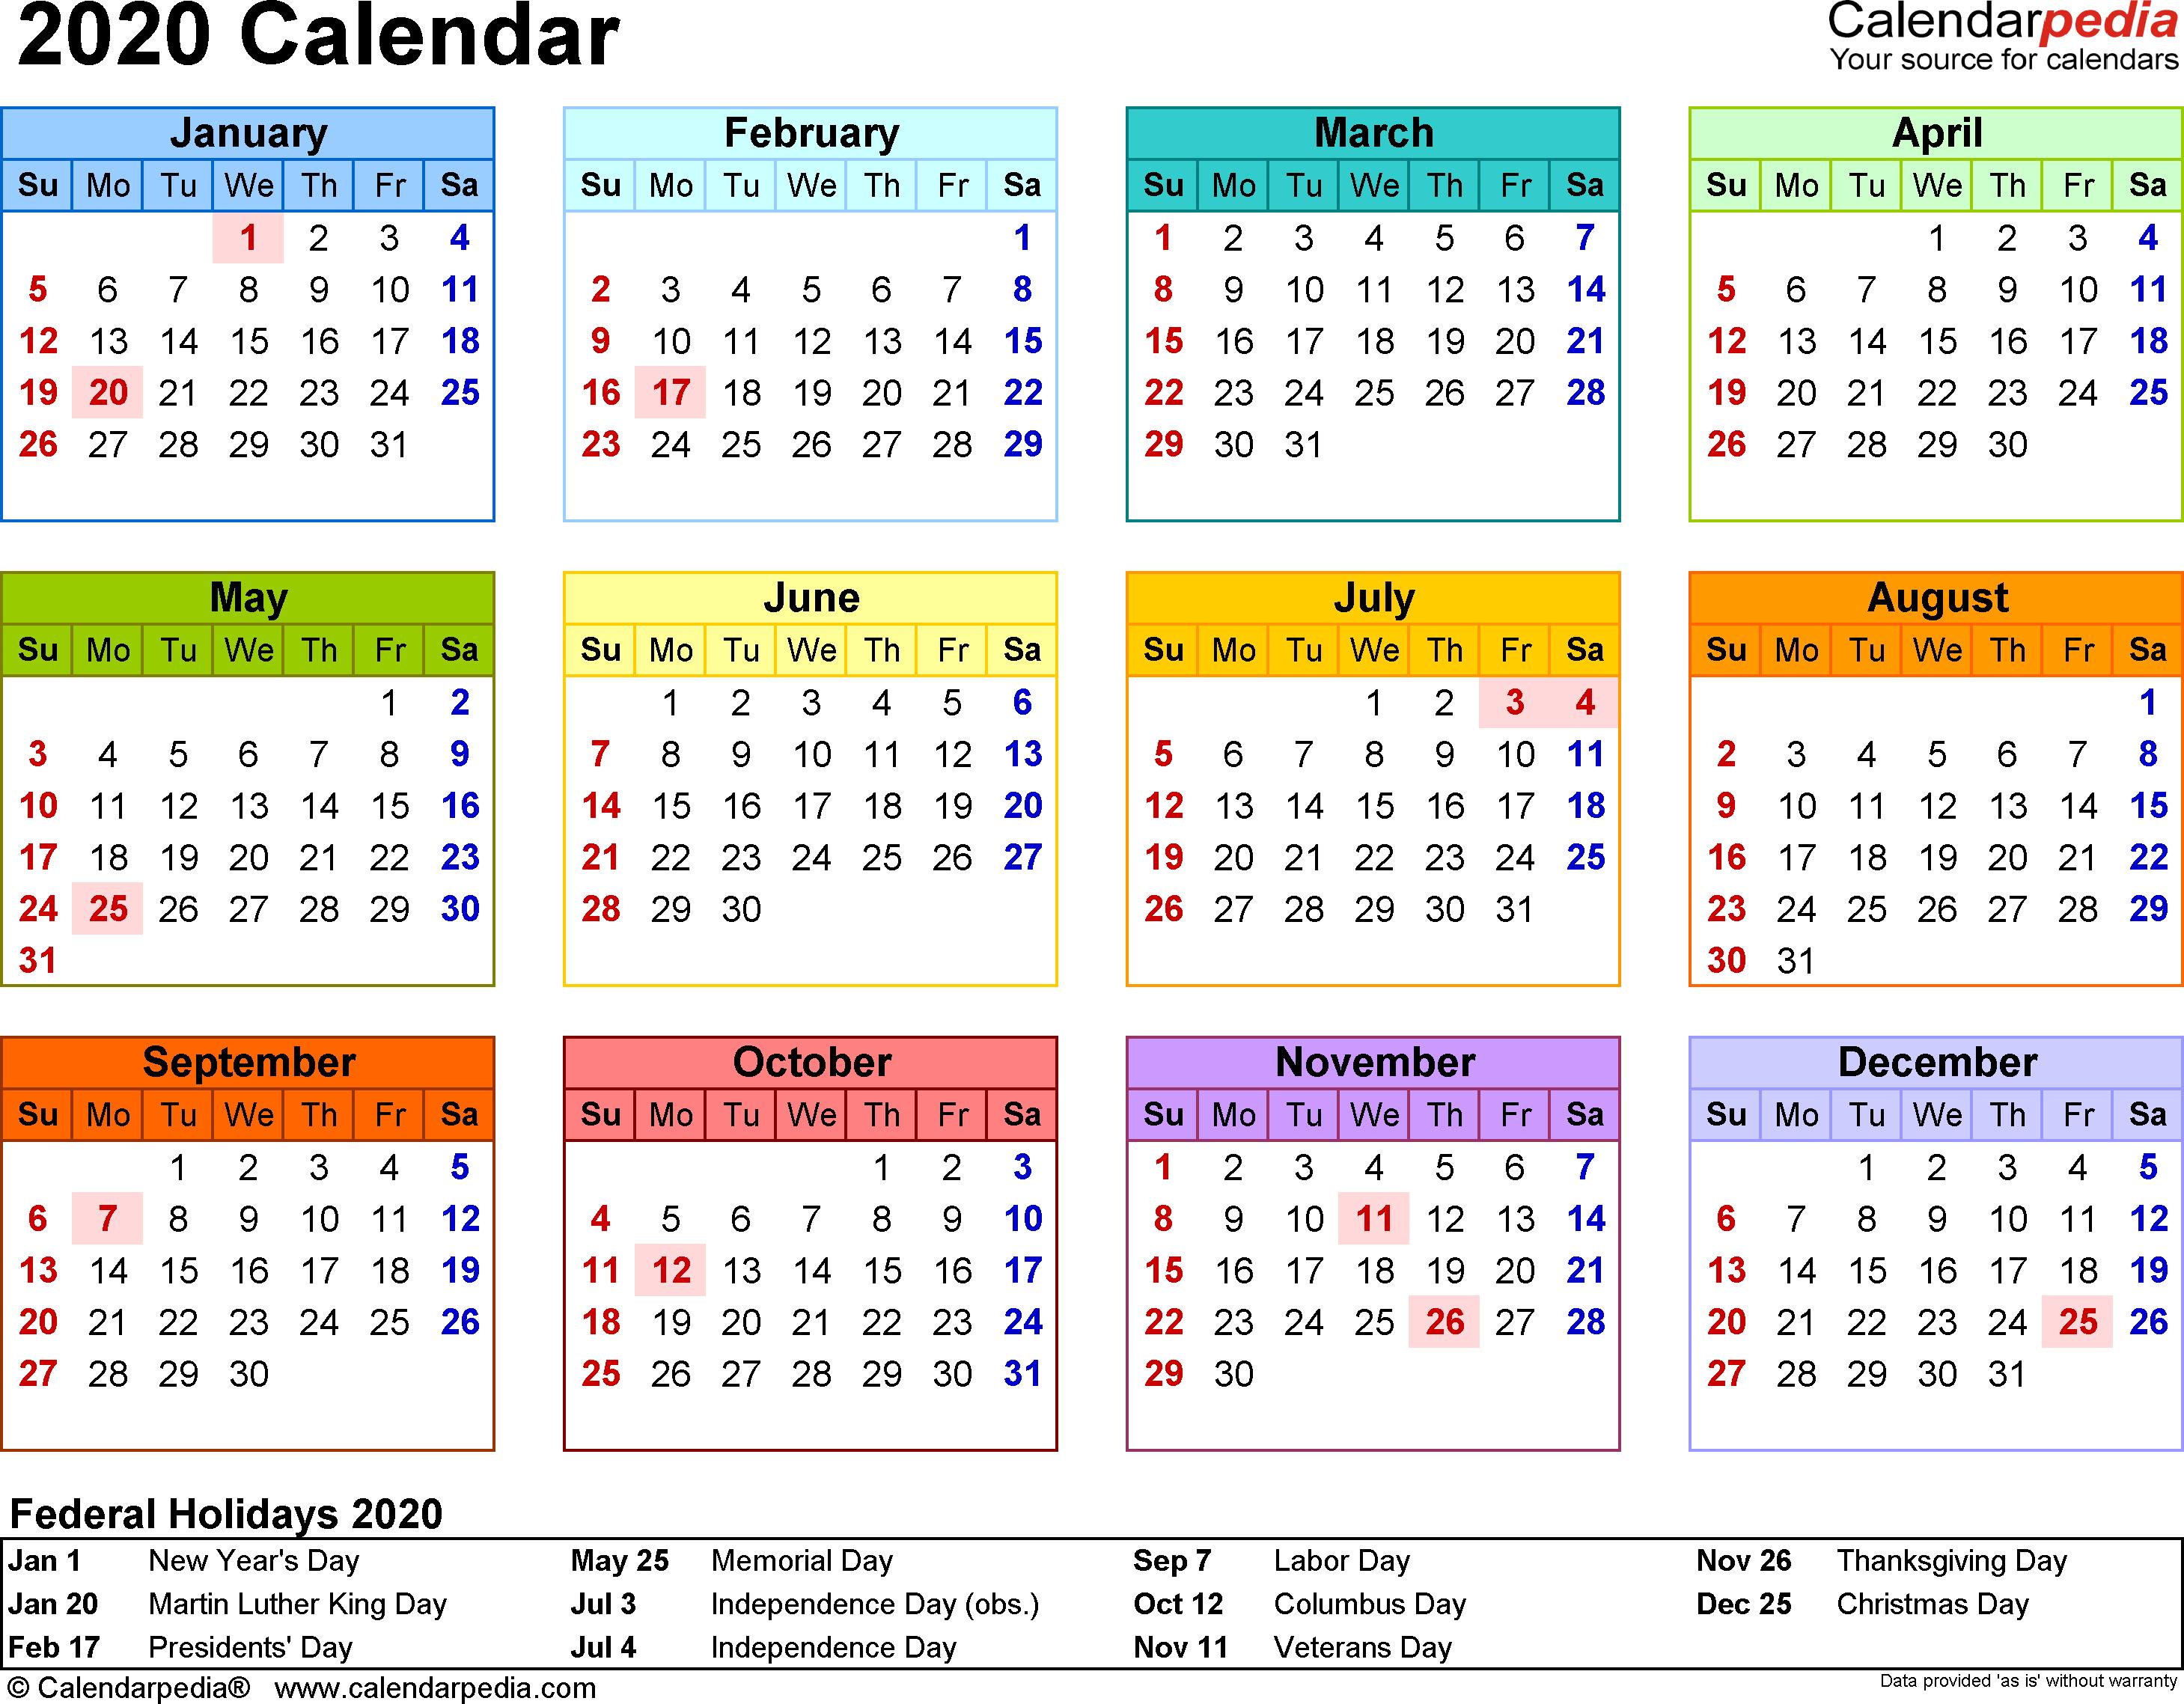 2020 Calendar Excel – Calendar Printable Week intended for 2020 Calendar Hk Excel